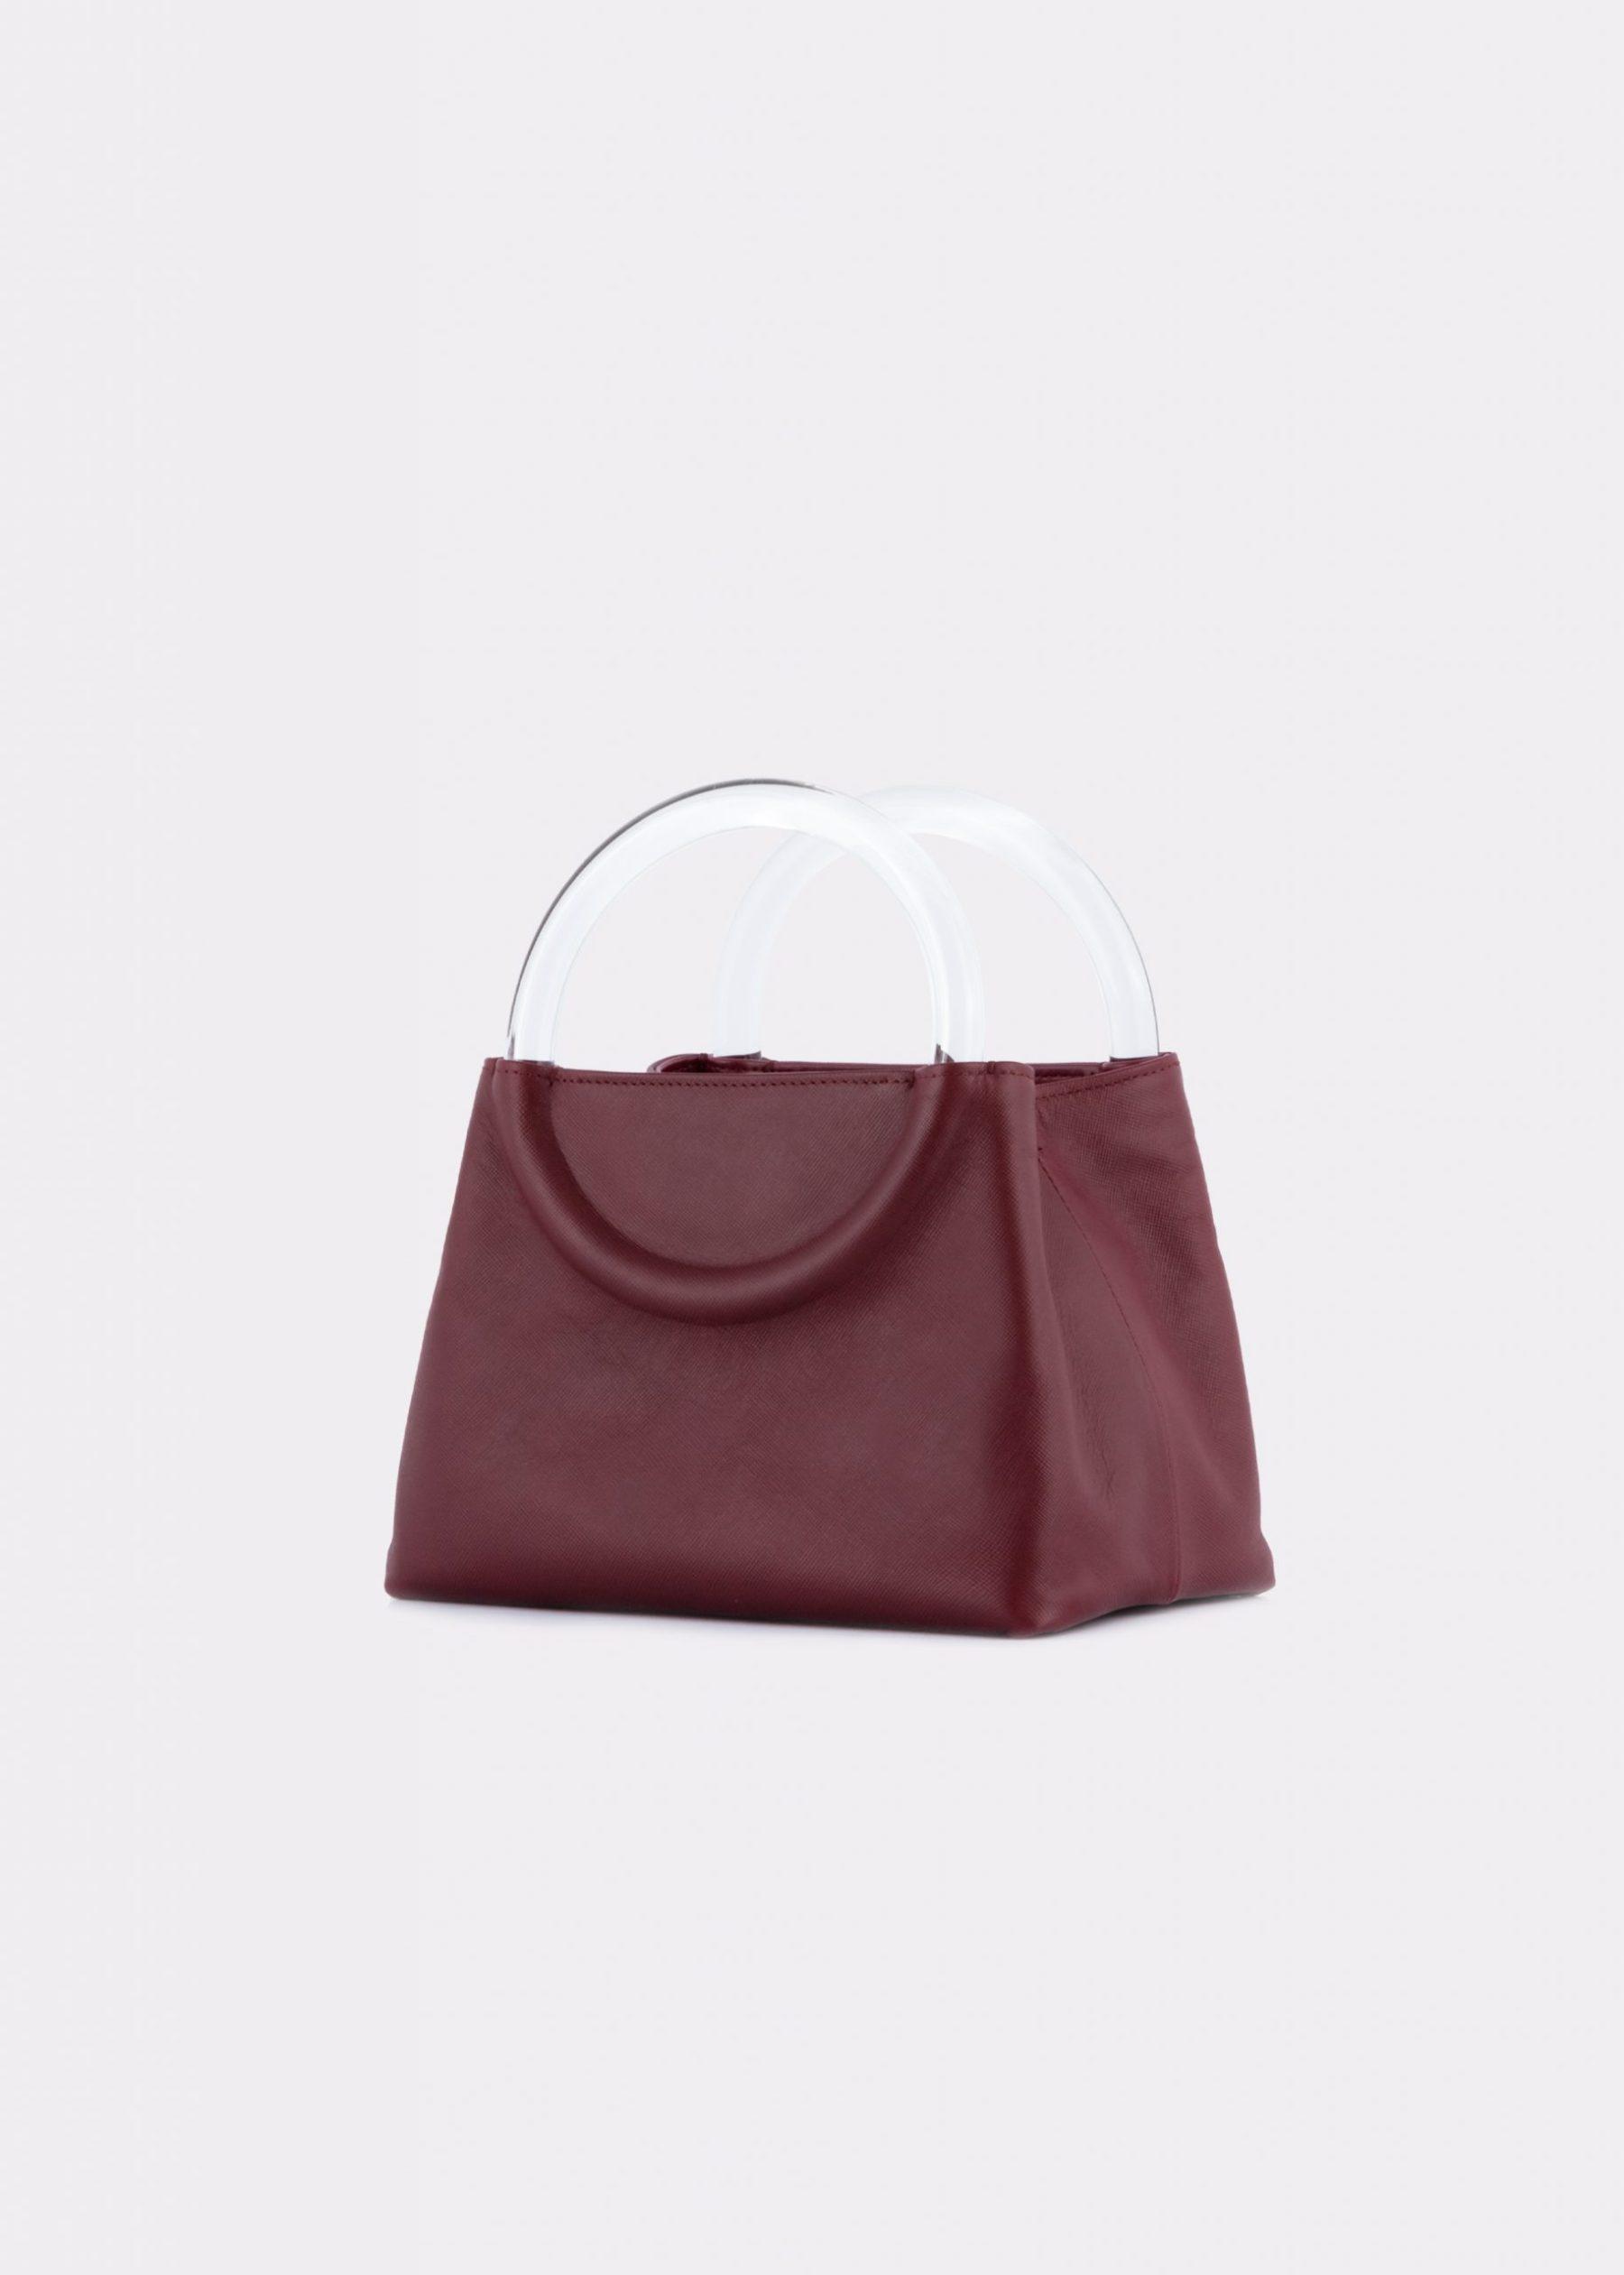 NIDO-Bolla_Mini-bag-bordeaux_side view